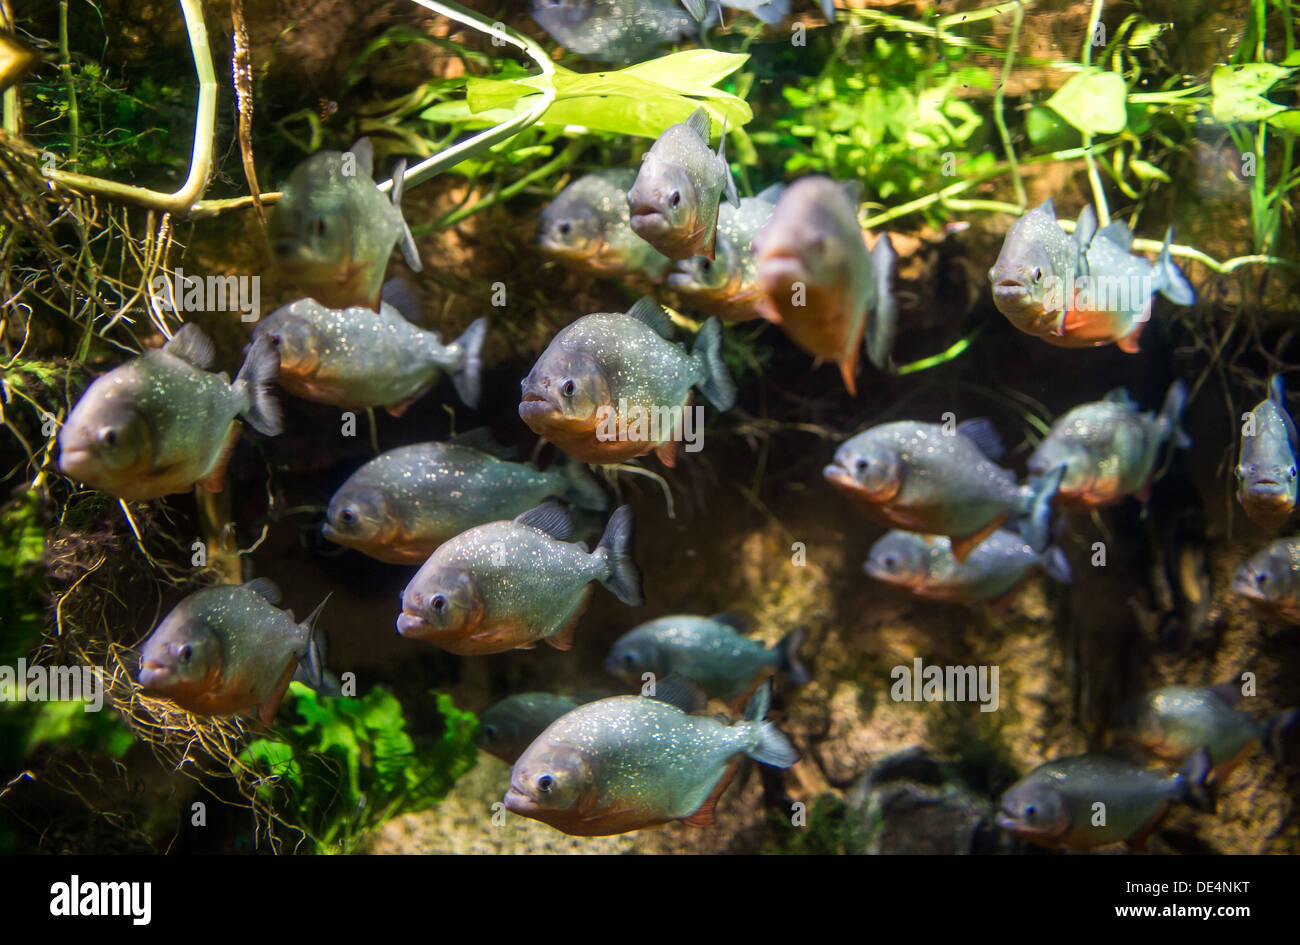 Piranha (Colossoma macropomum) dans un aquarium sur un fond vert Banque D'Images